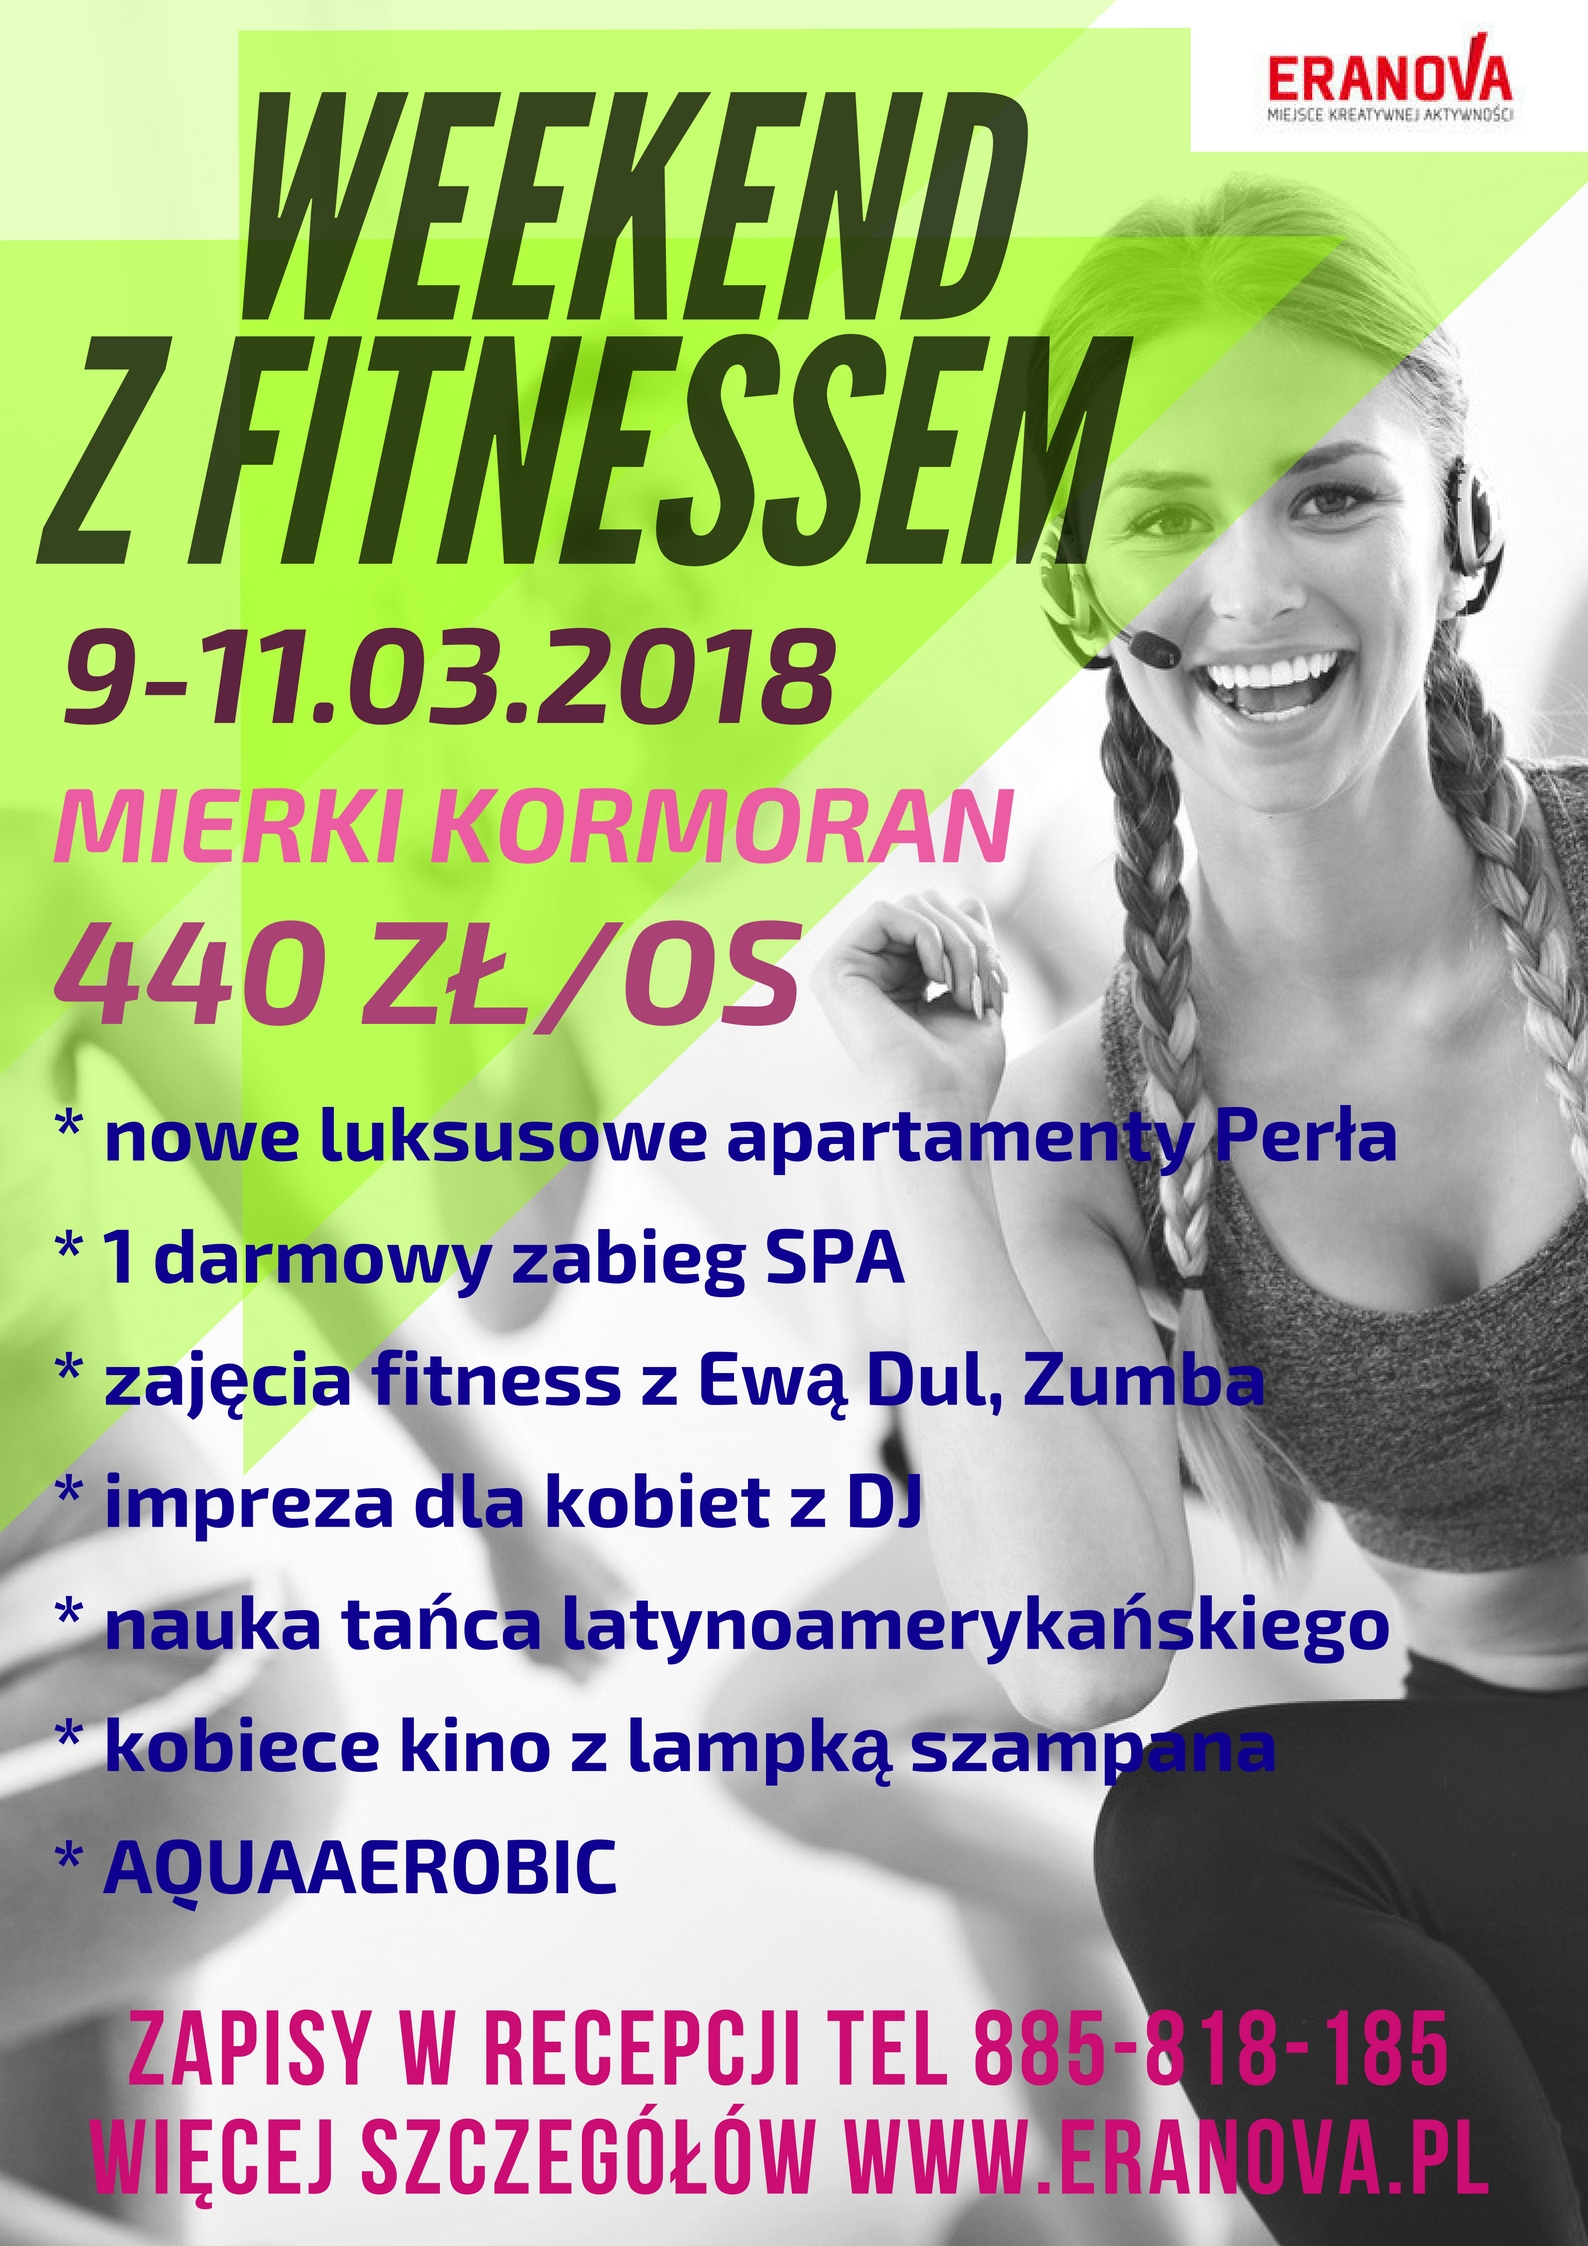 http://m.eranova.pl/2018/01/orig/weekend-z-fitness-do-druku-1-2554.jpg